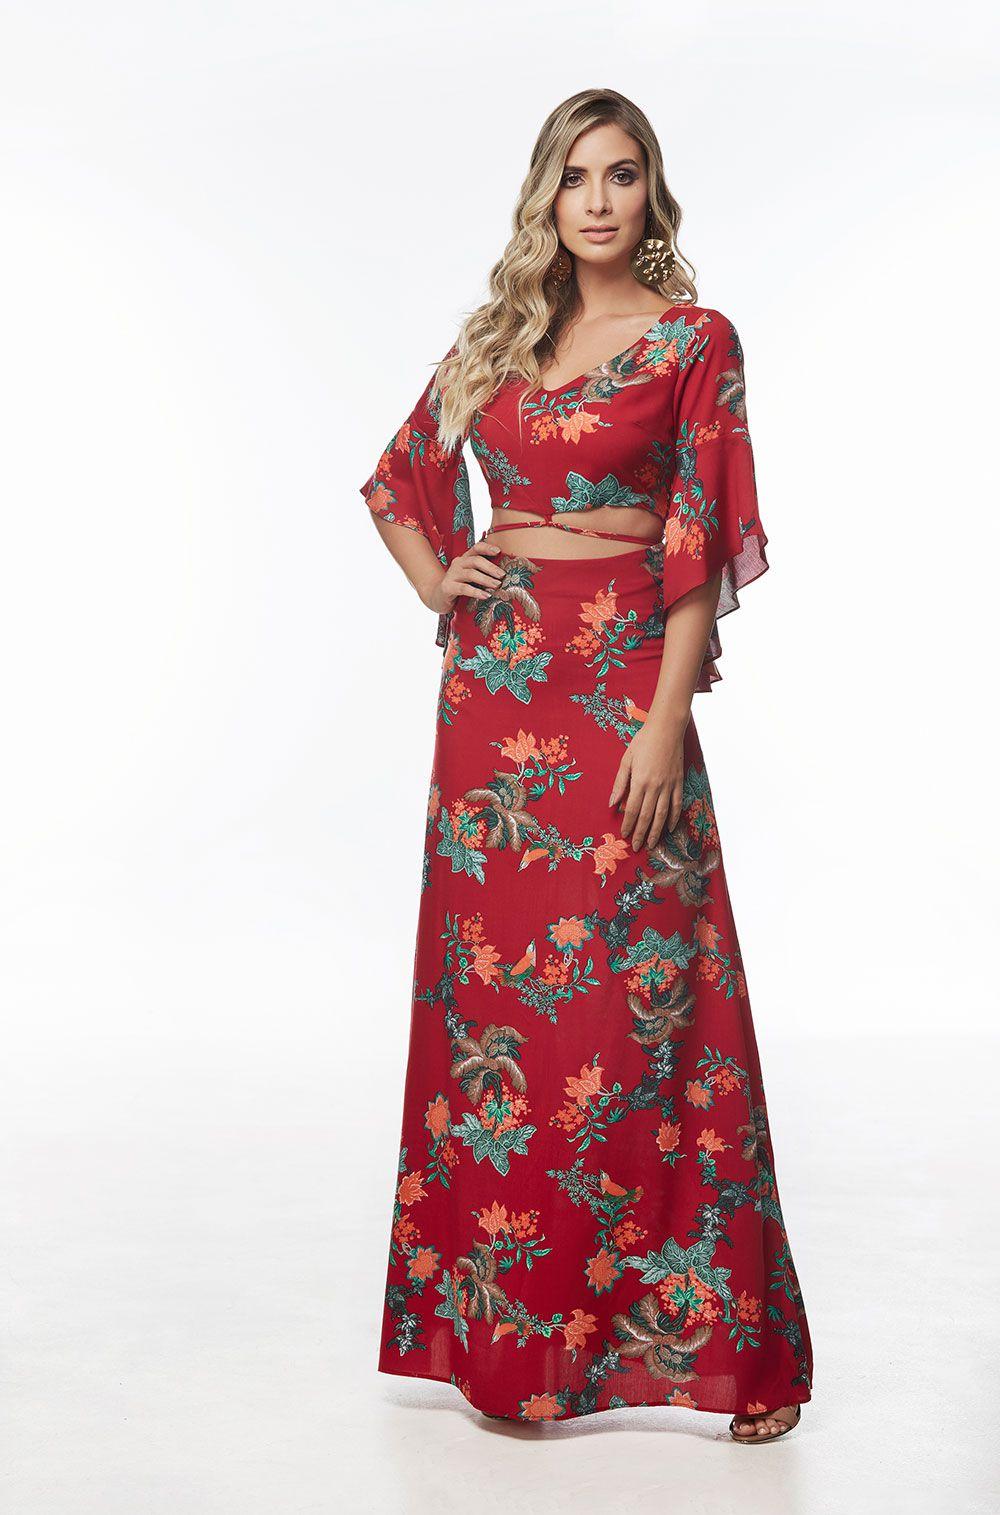 6b53633b53 Vestido Longo Estampado em Viscose Vermelho - VANKOKE - Moda ...